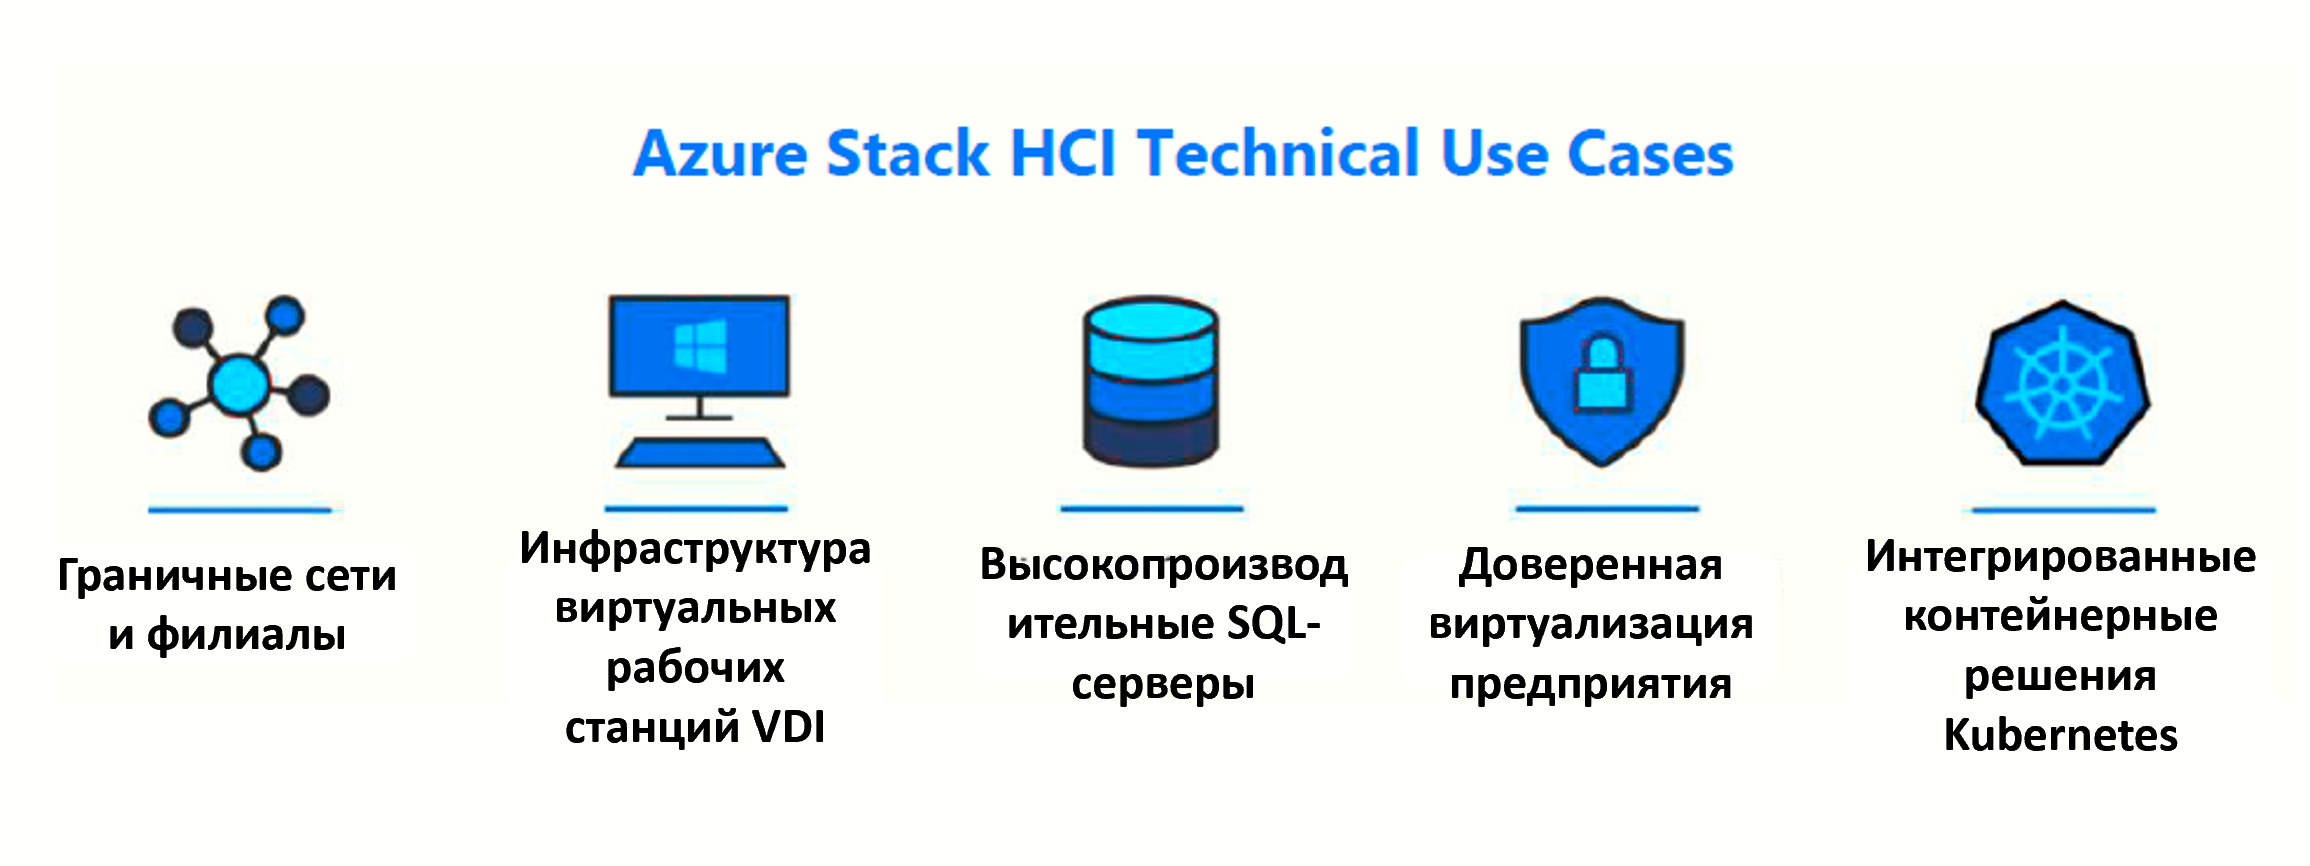 Azure Stack HCI Technical Use Case